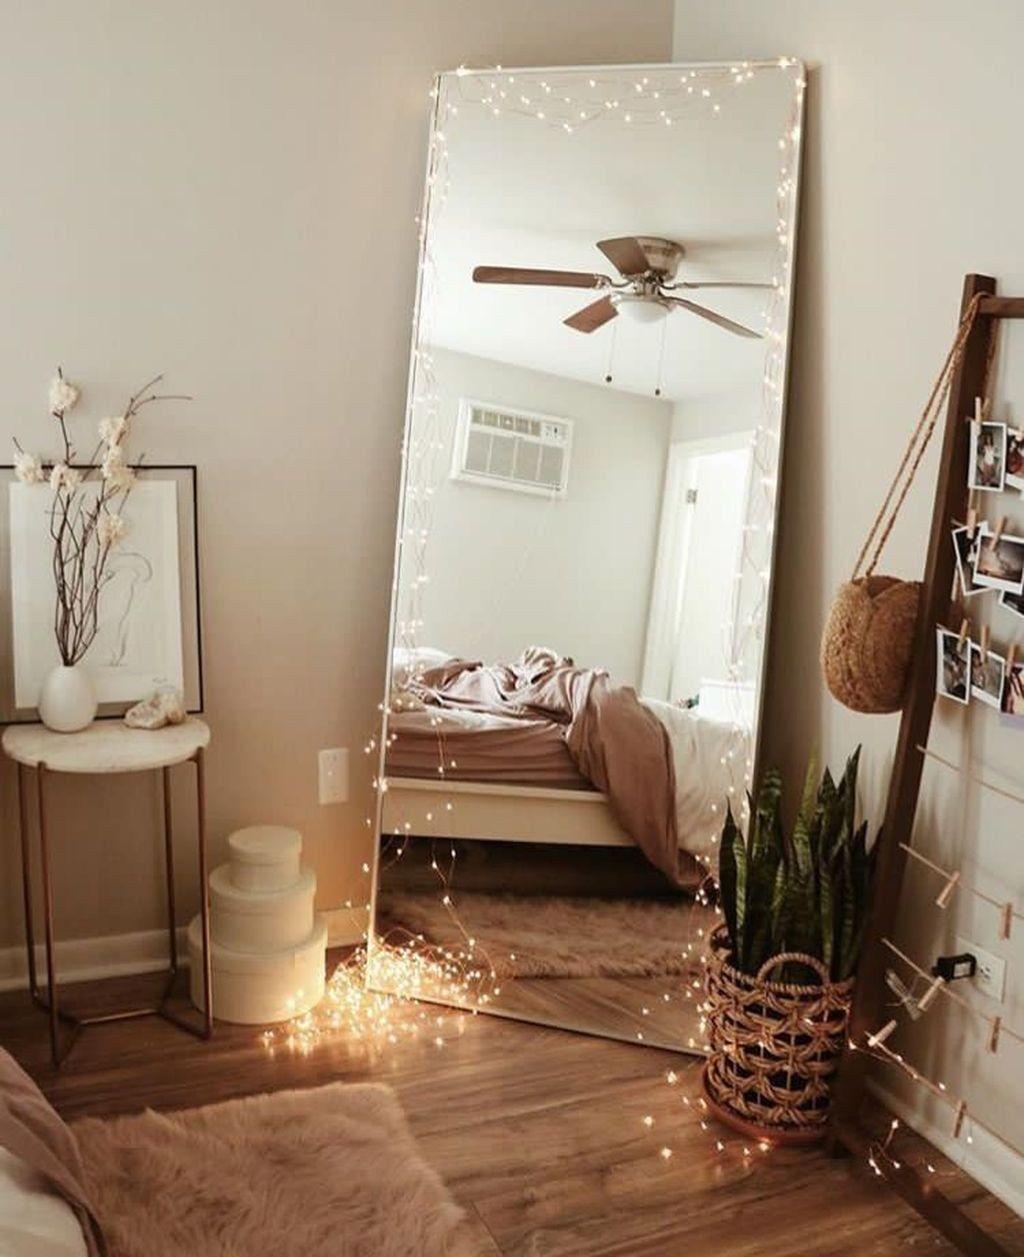 Beautiful Bedroom Mirror Ideas Can Improve Your Bedroom 47 Room Inspiration Bedroom Diy Apartment Decor Room Decor